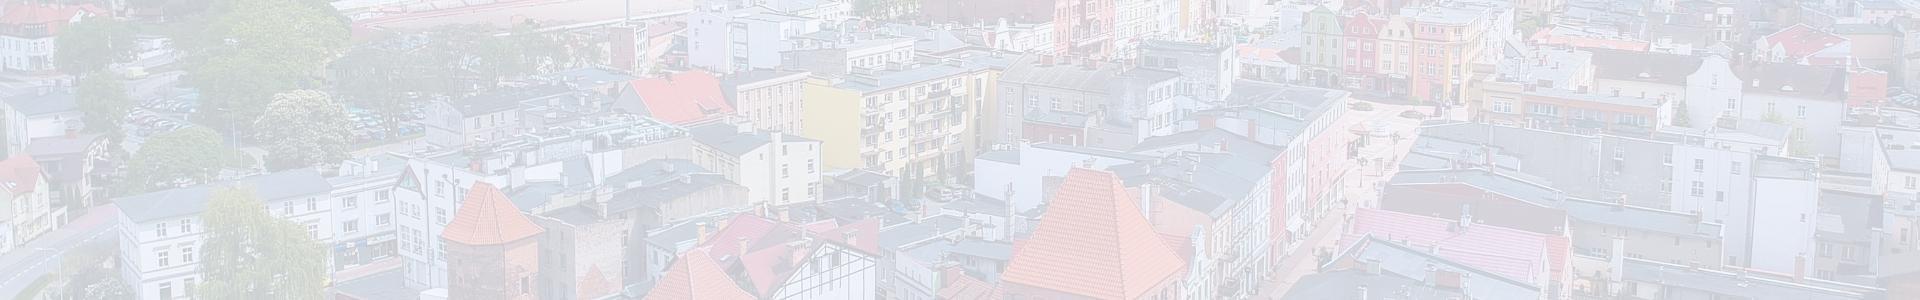 Banner miasto z góry